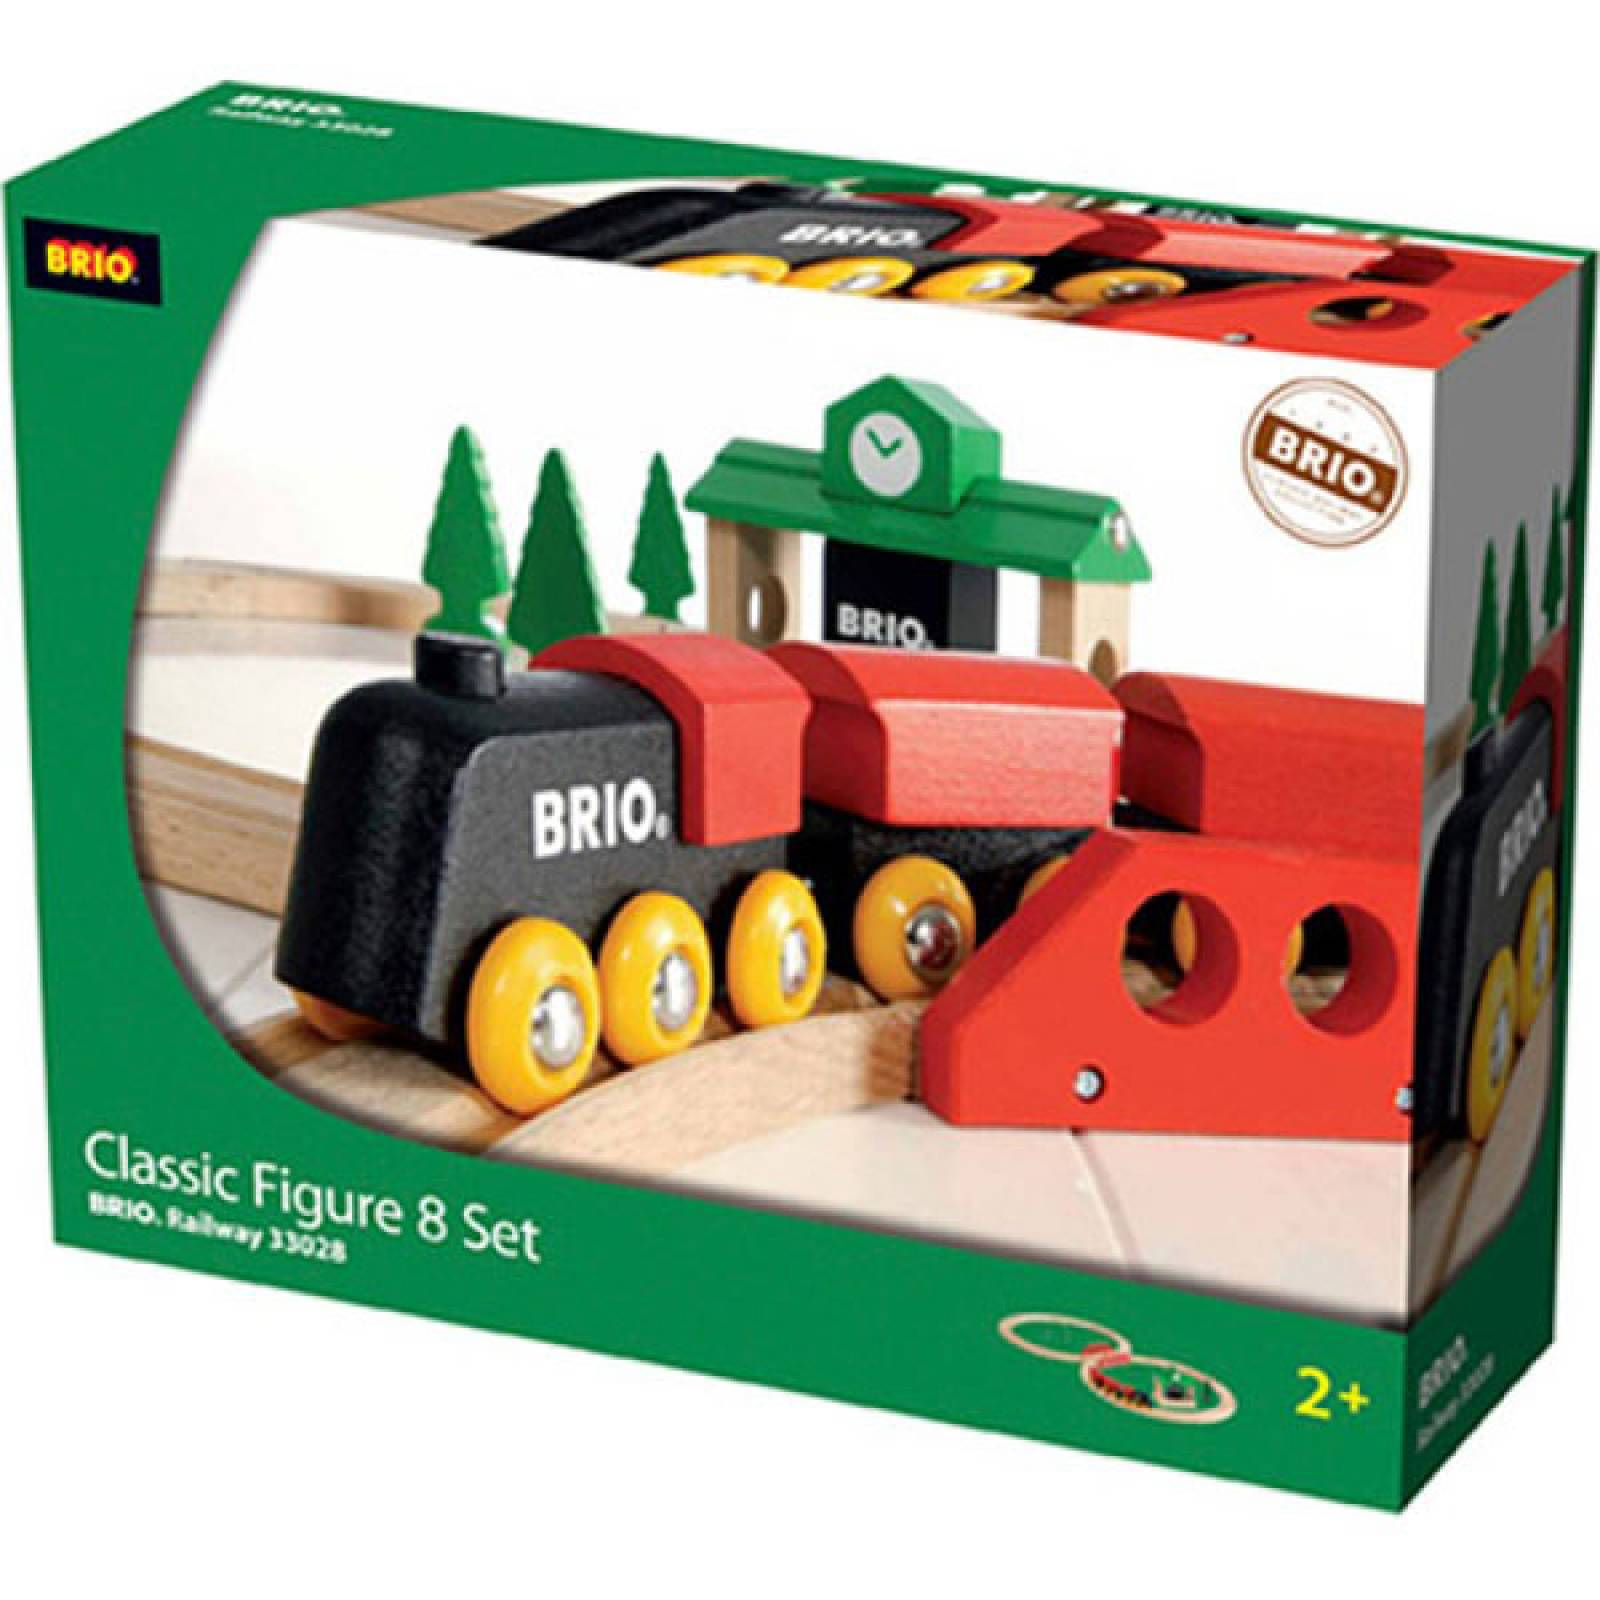 Classic Figure of 8 Set BRIO Wooden Railway 3+ thumbnails